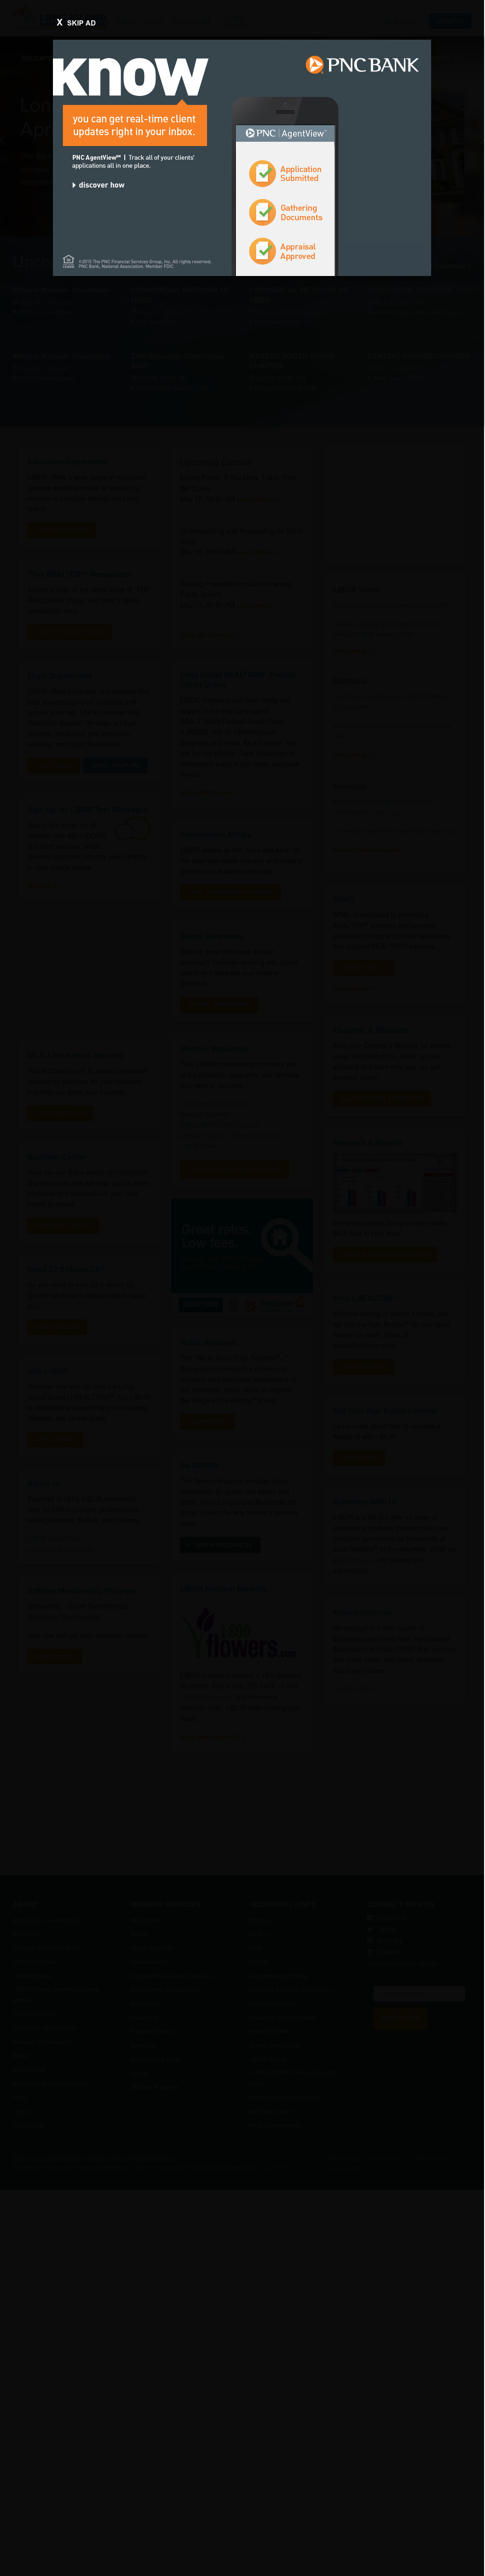 Lirealtor Competitors, Revenue and Employees - Owler Company Profile